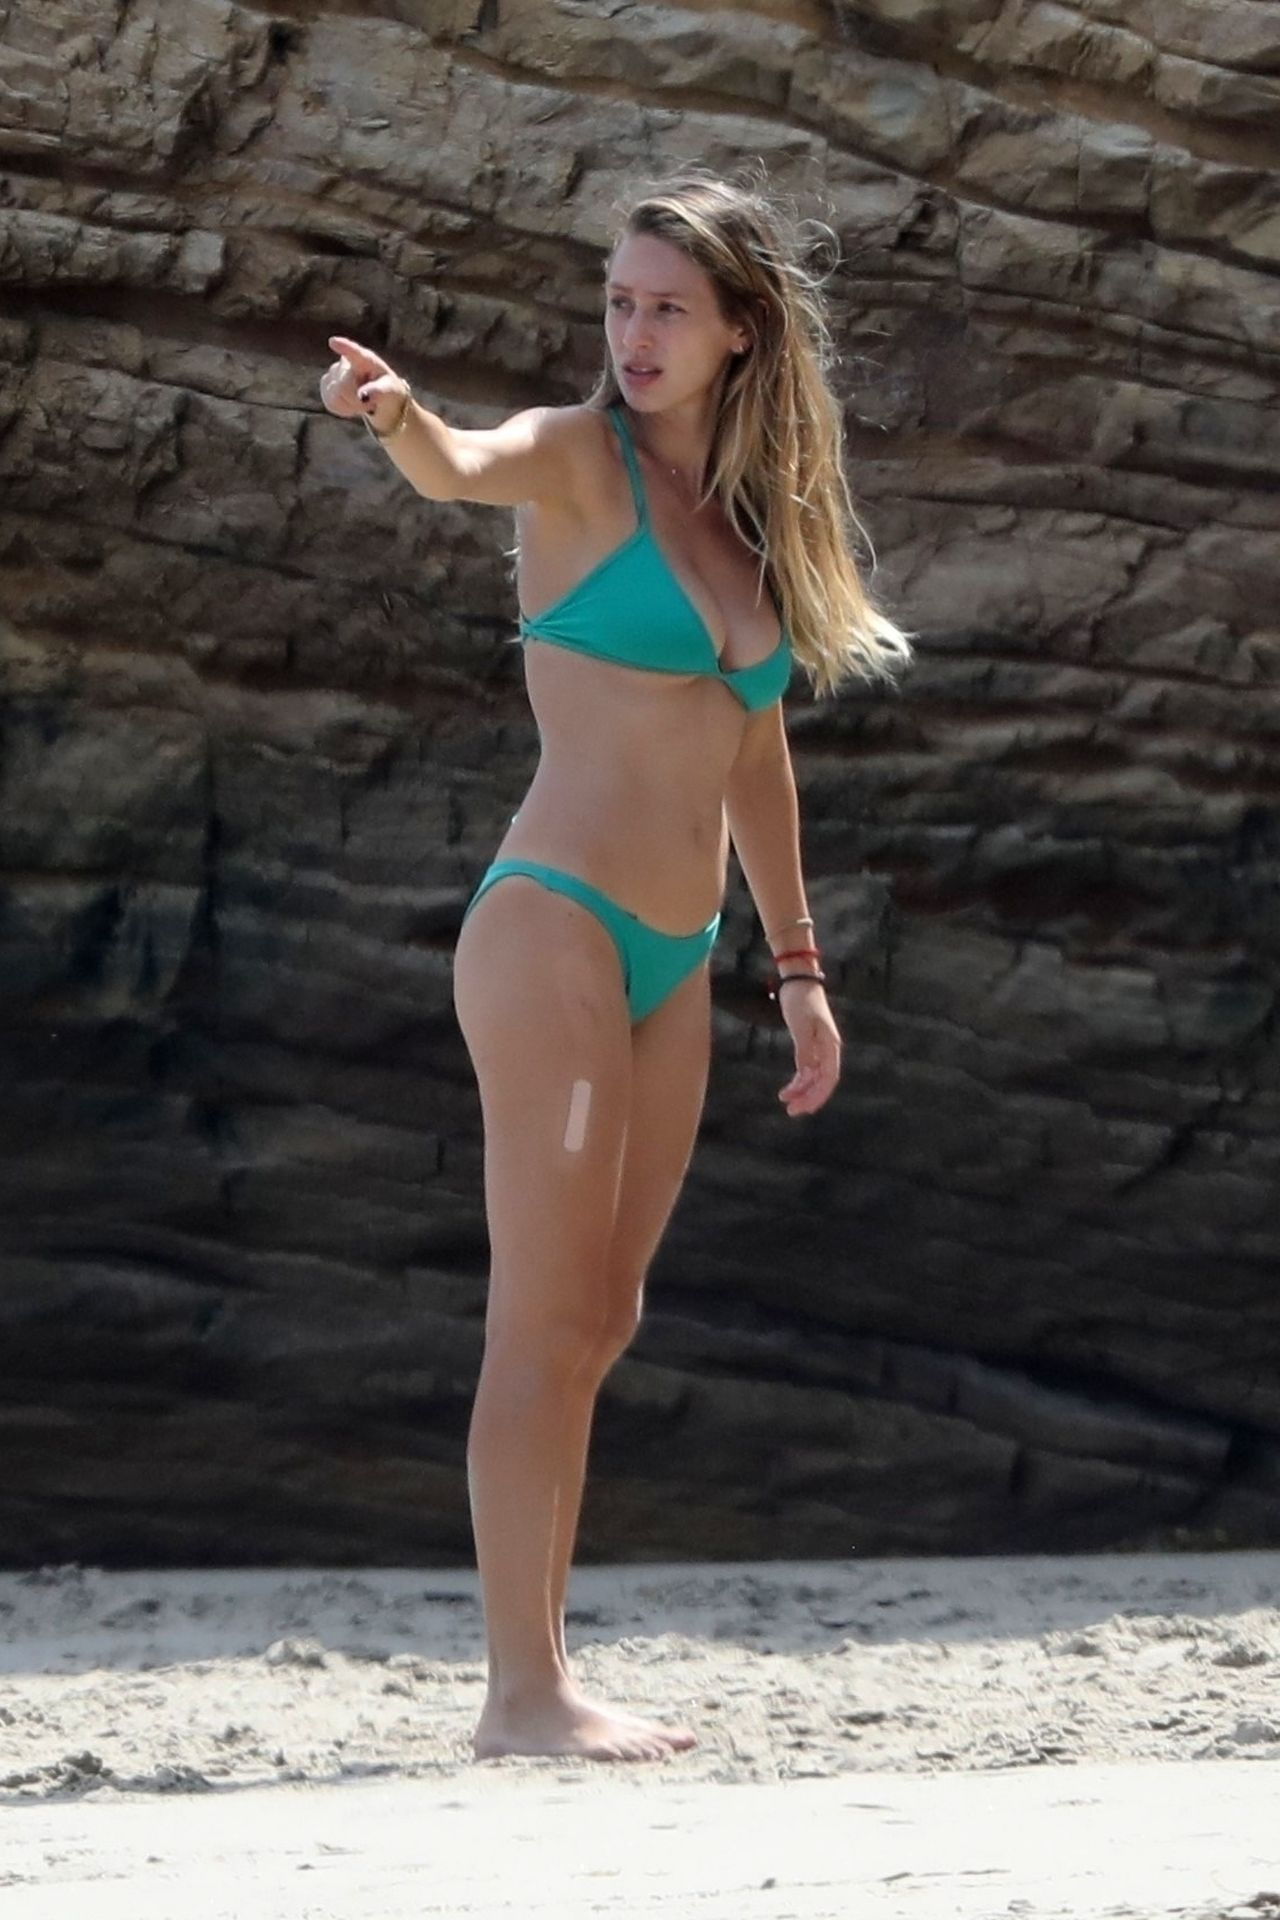 Dylan Penn Shows Off Bikini Body While Beachside in Brazil